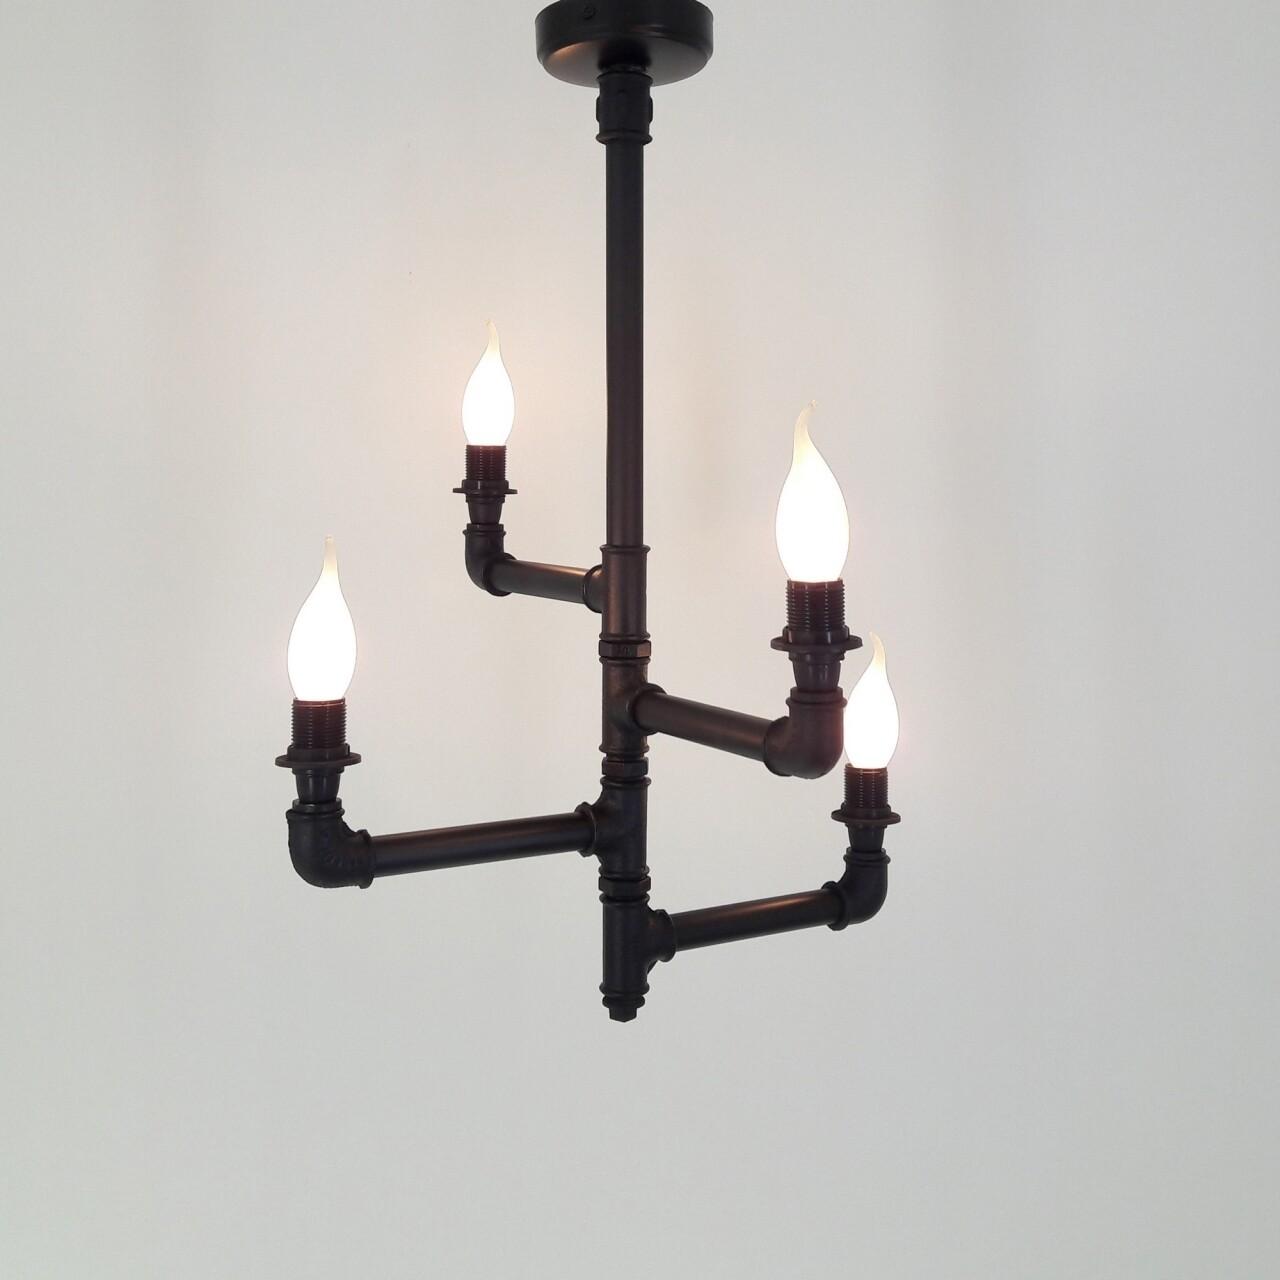 Candelabru All Design, metal, 40x40x60 cm, Mum Black